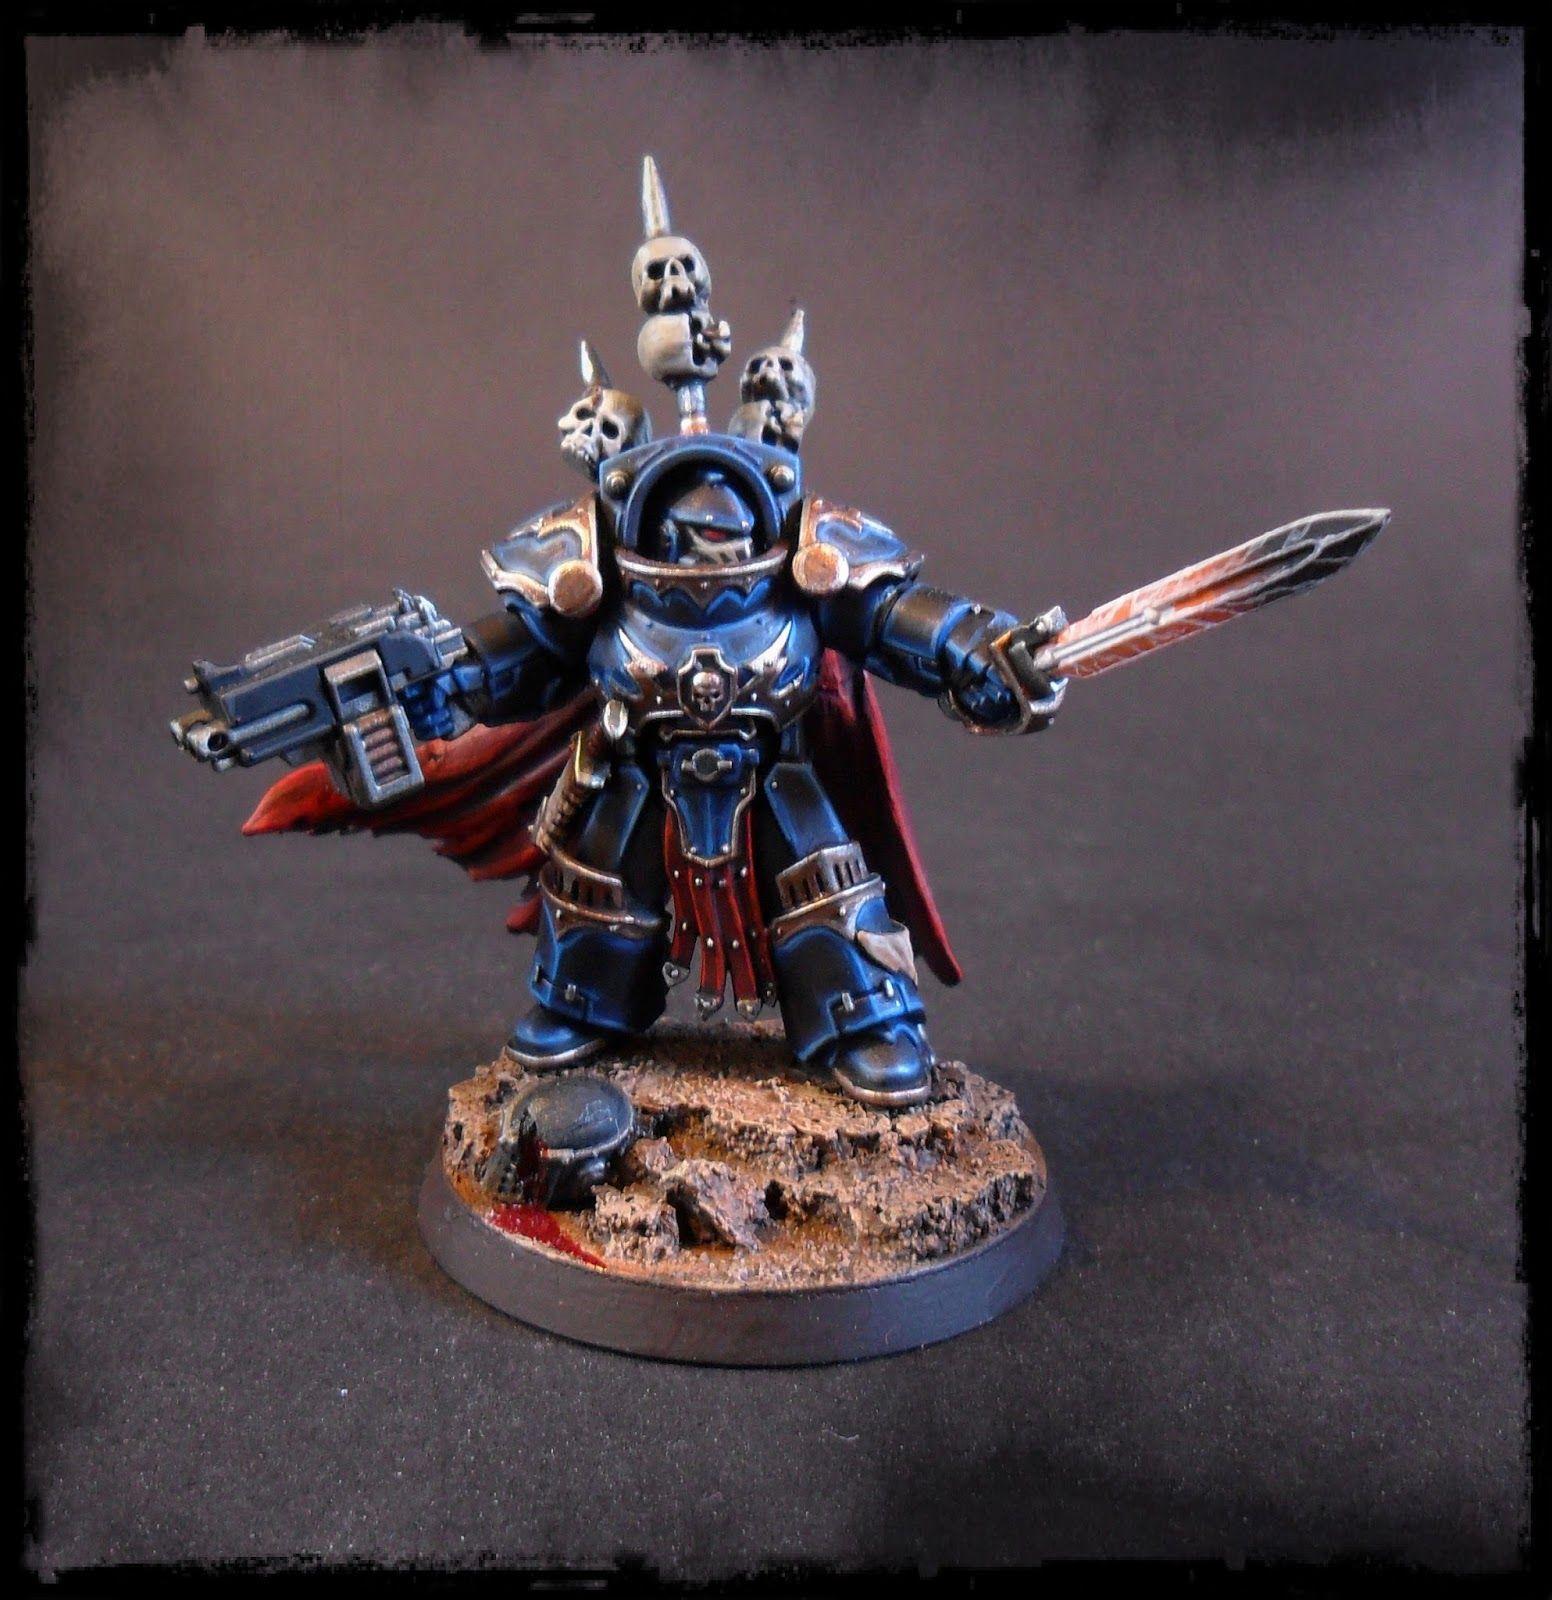 Pré-commande-Games Workshop-Warhammer 40,000 Chaos Knights-Chevalier desecr...